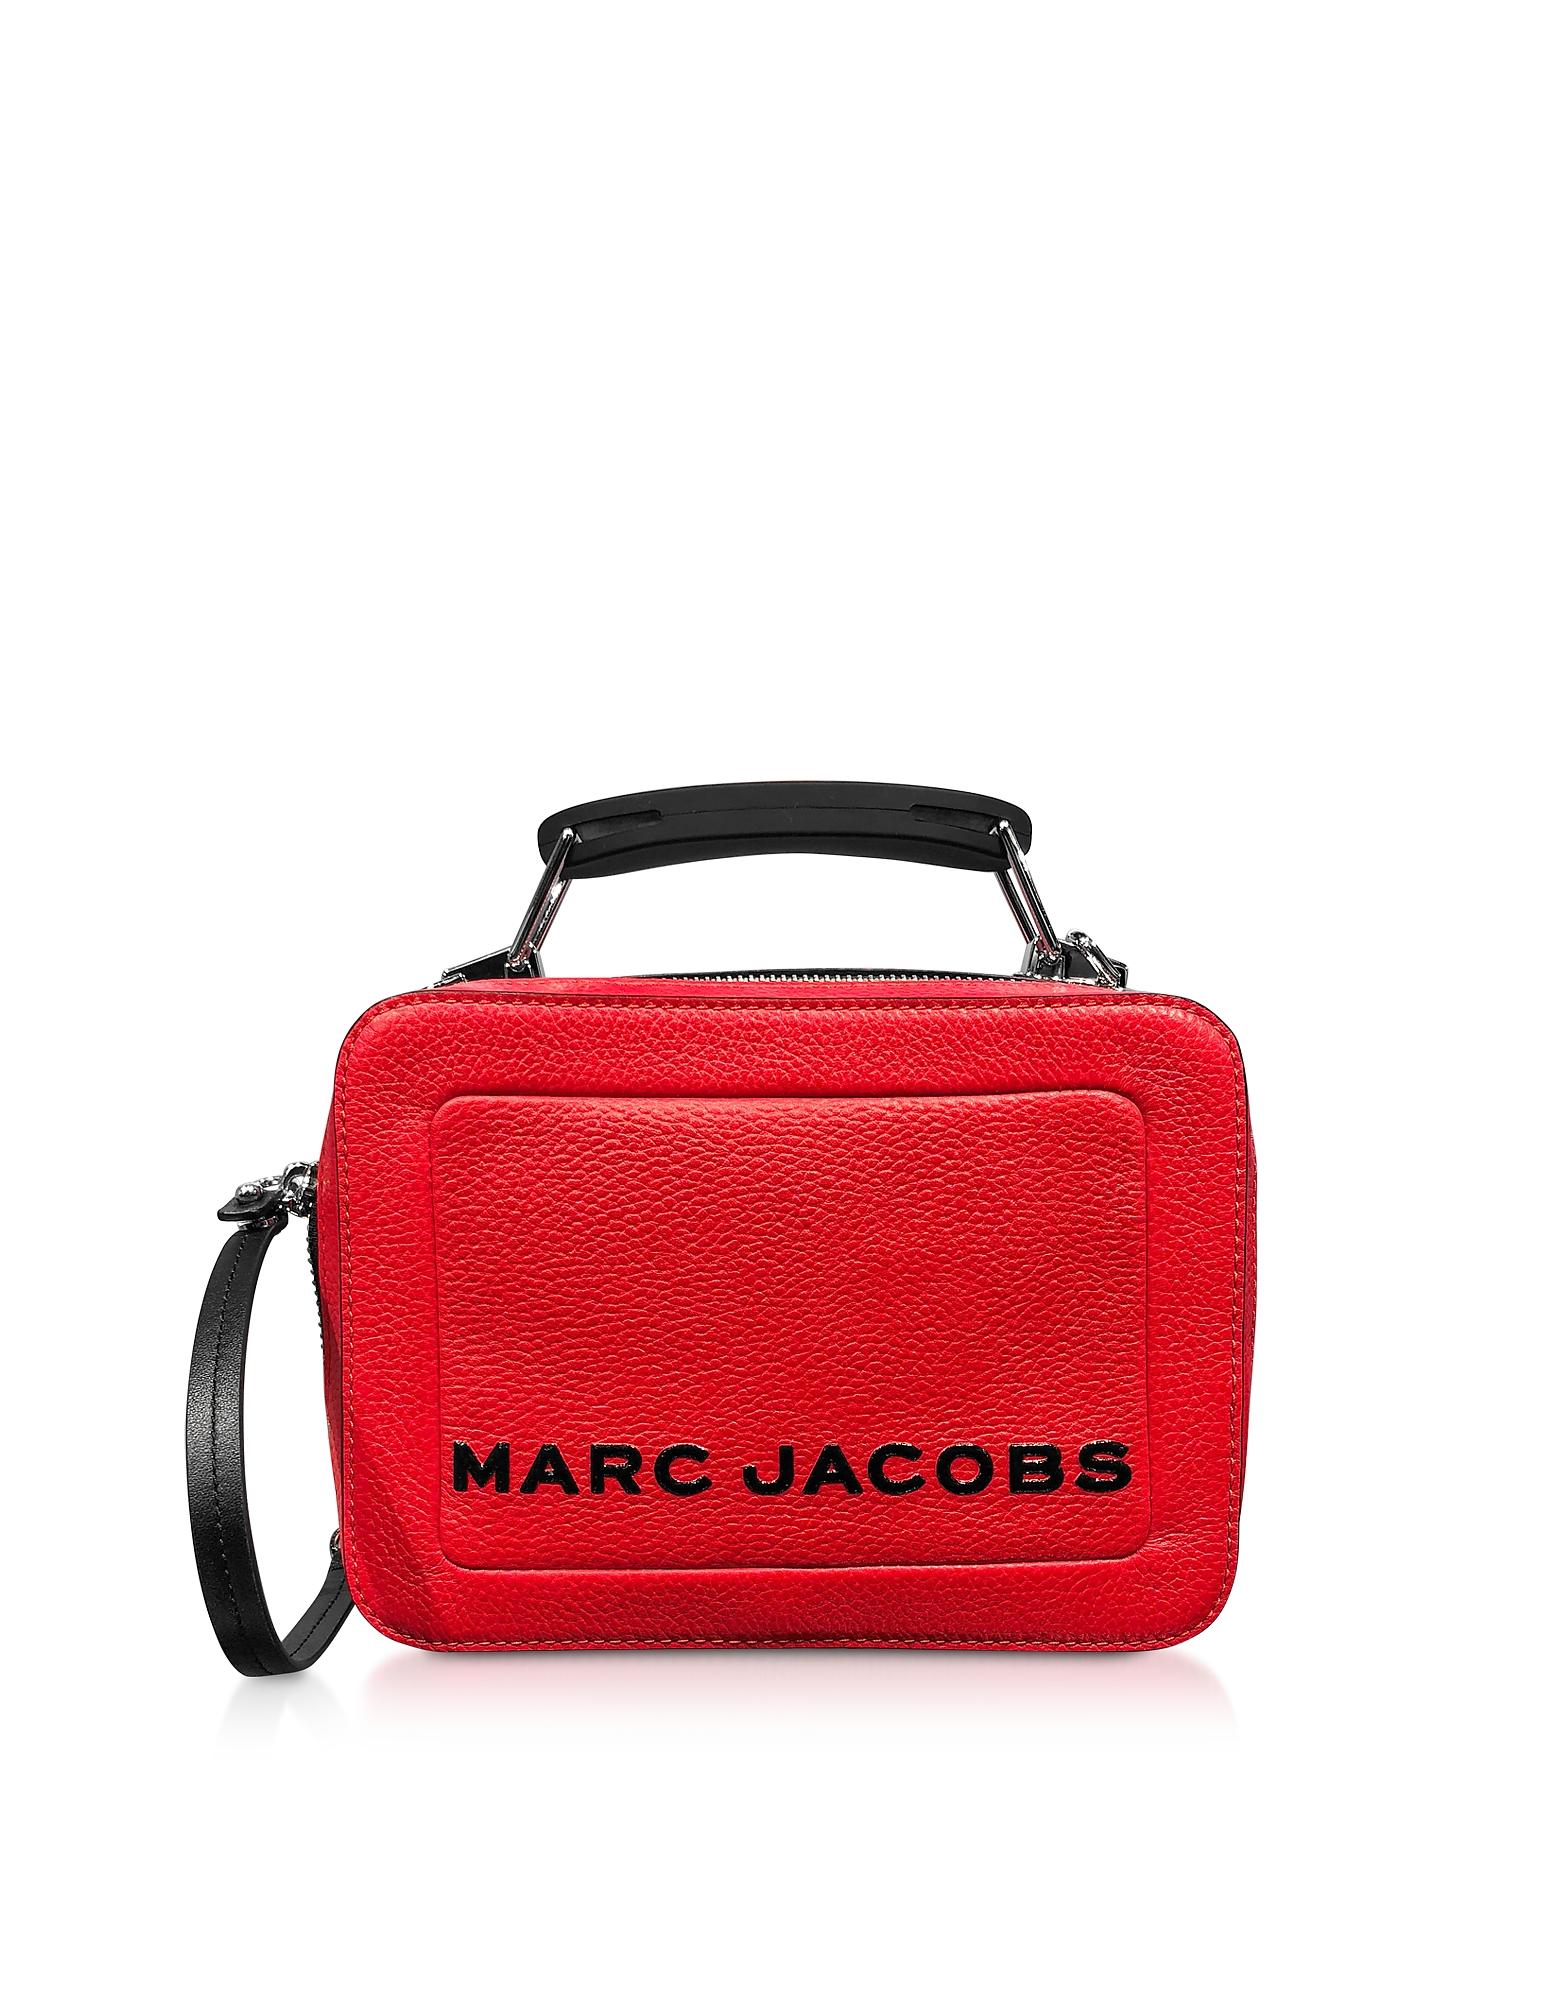 The Box 20 Satchel Bag